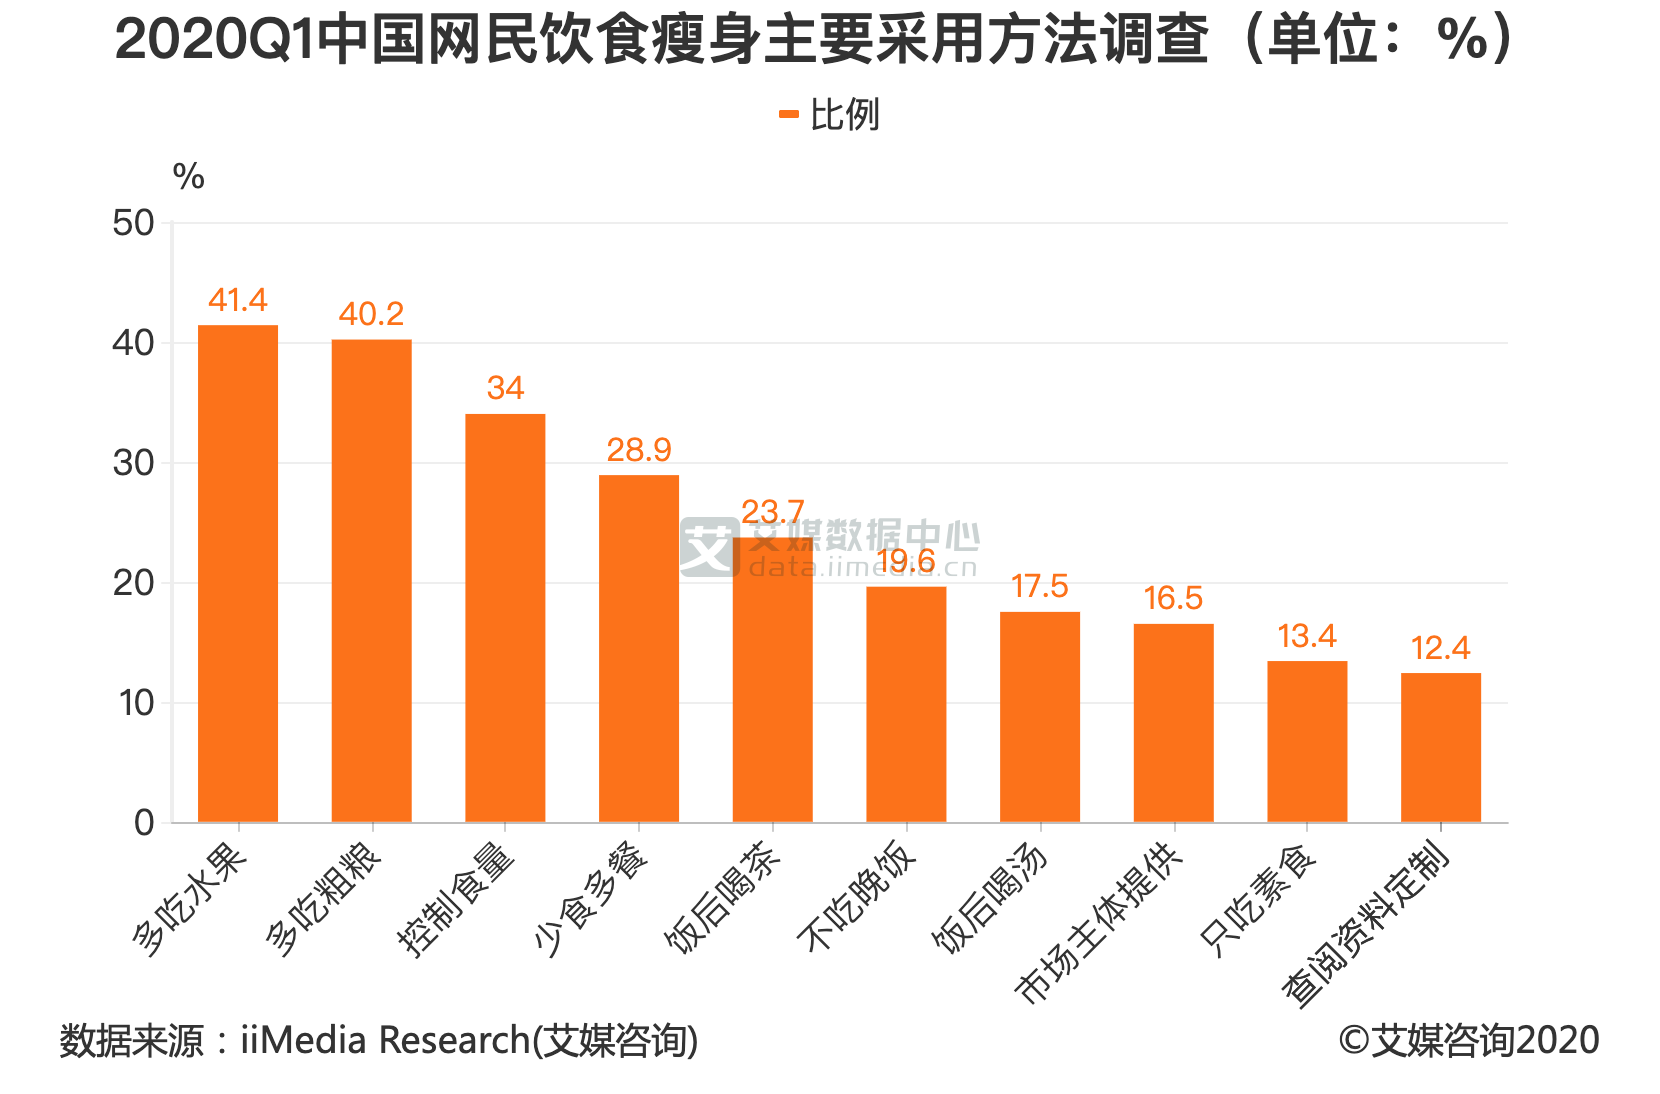 2020Q1中国网民饮食瘦身主要采用方法调查(单位:%)